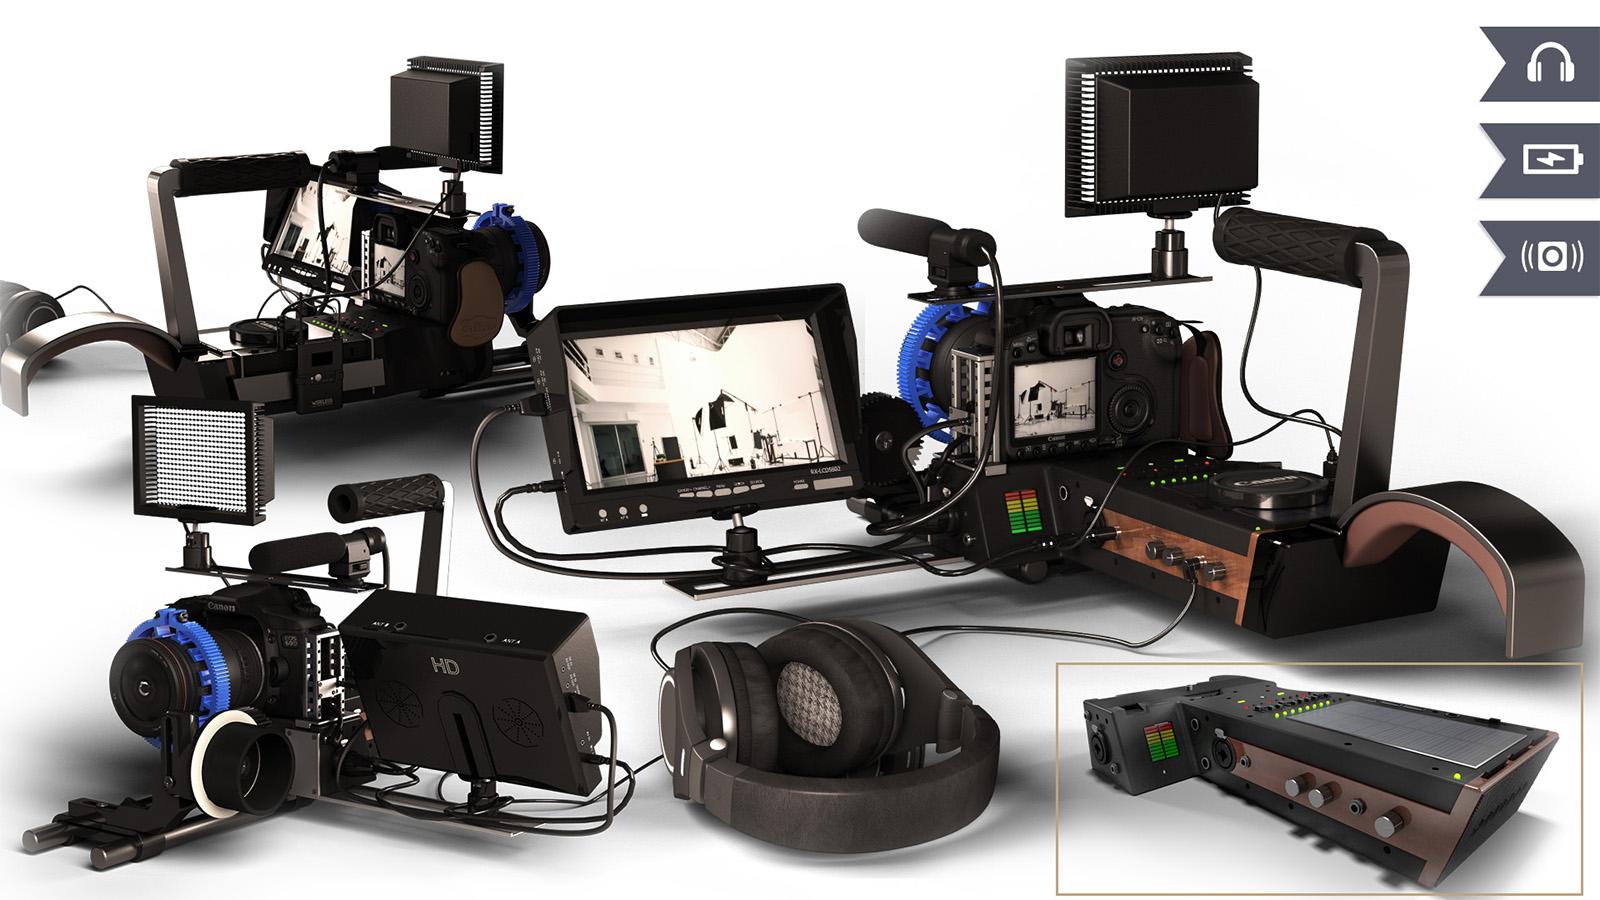 Camera Panasonic Dslr Video Camera dslr digital video camera accessories part 3 pandoradslroptimizer2 pandoradslroptimizer4 pandoradslroptimizer3